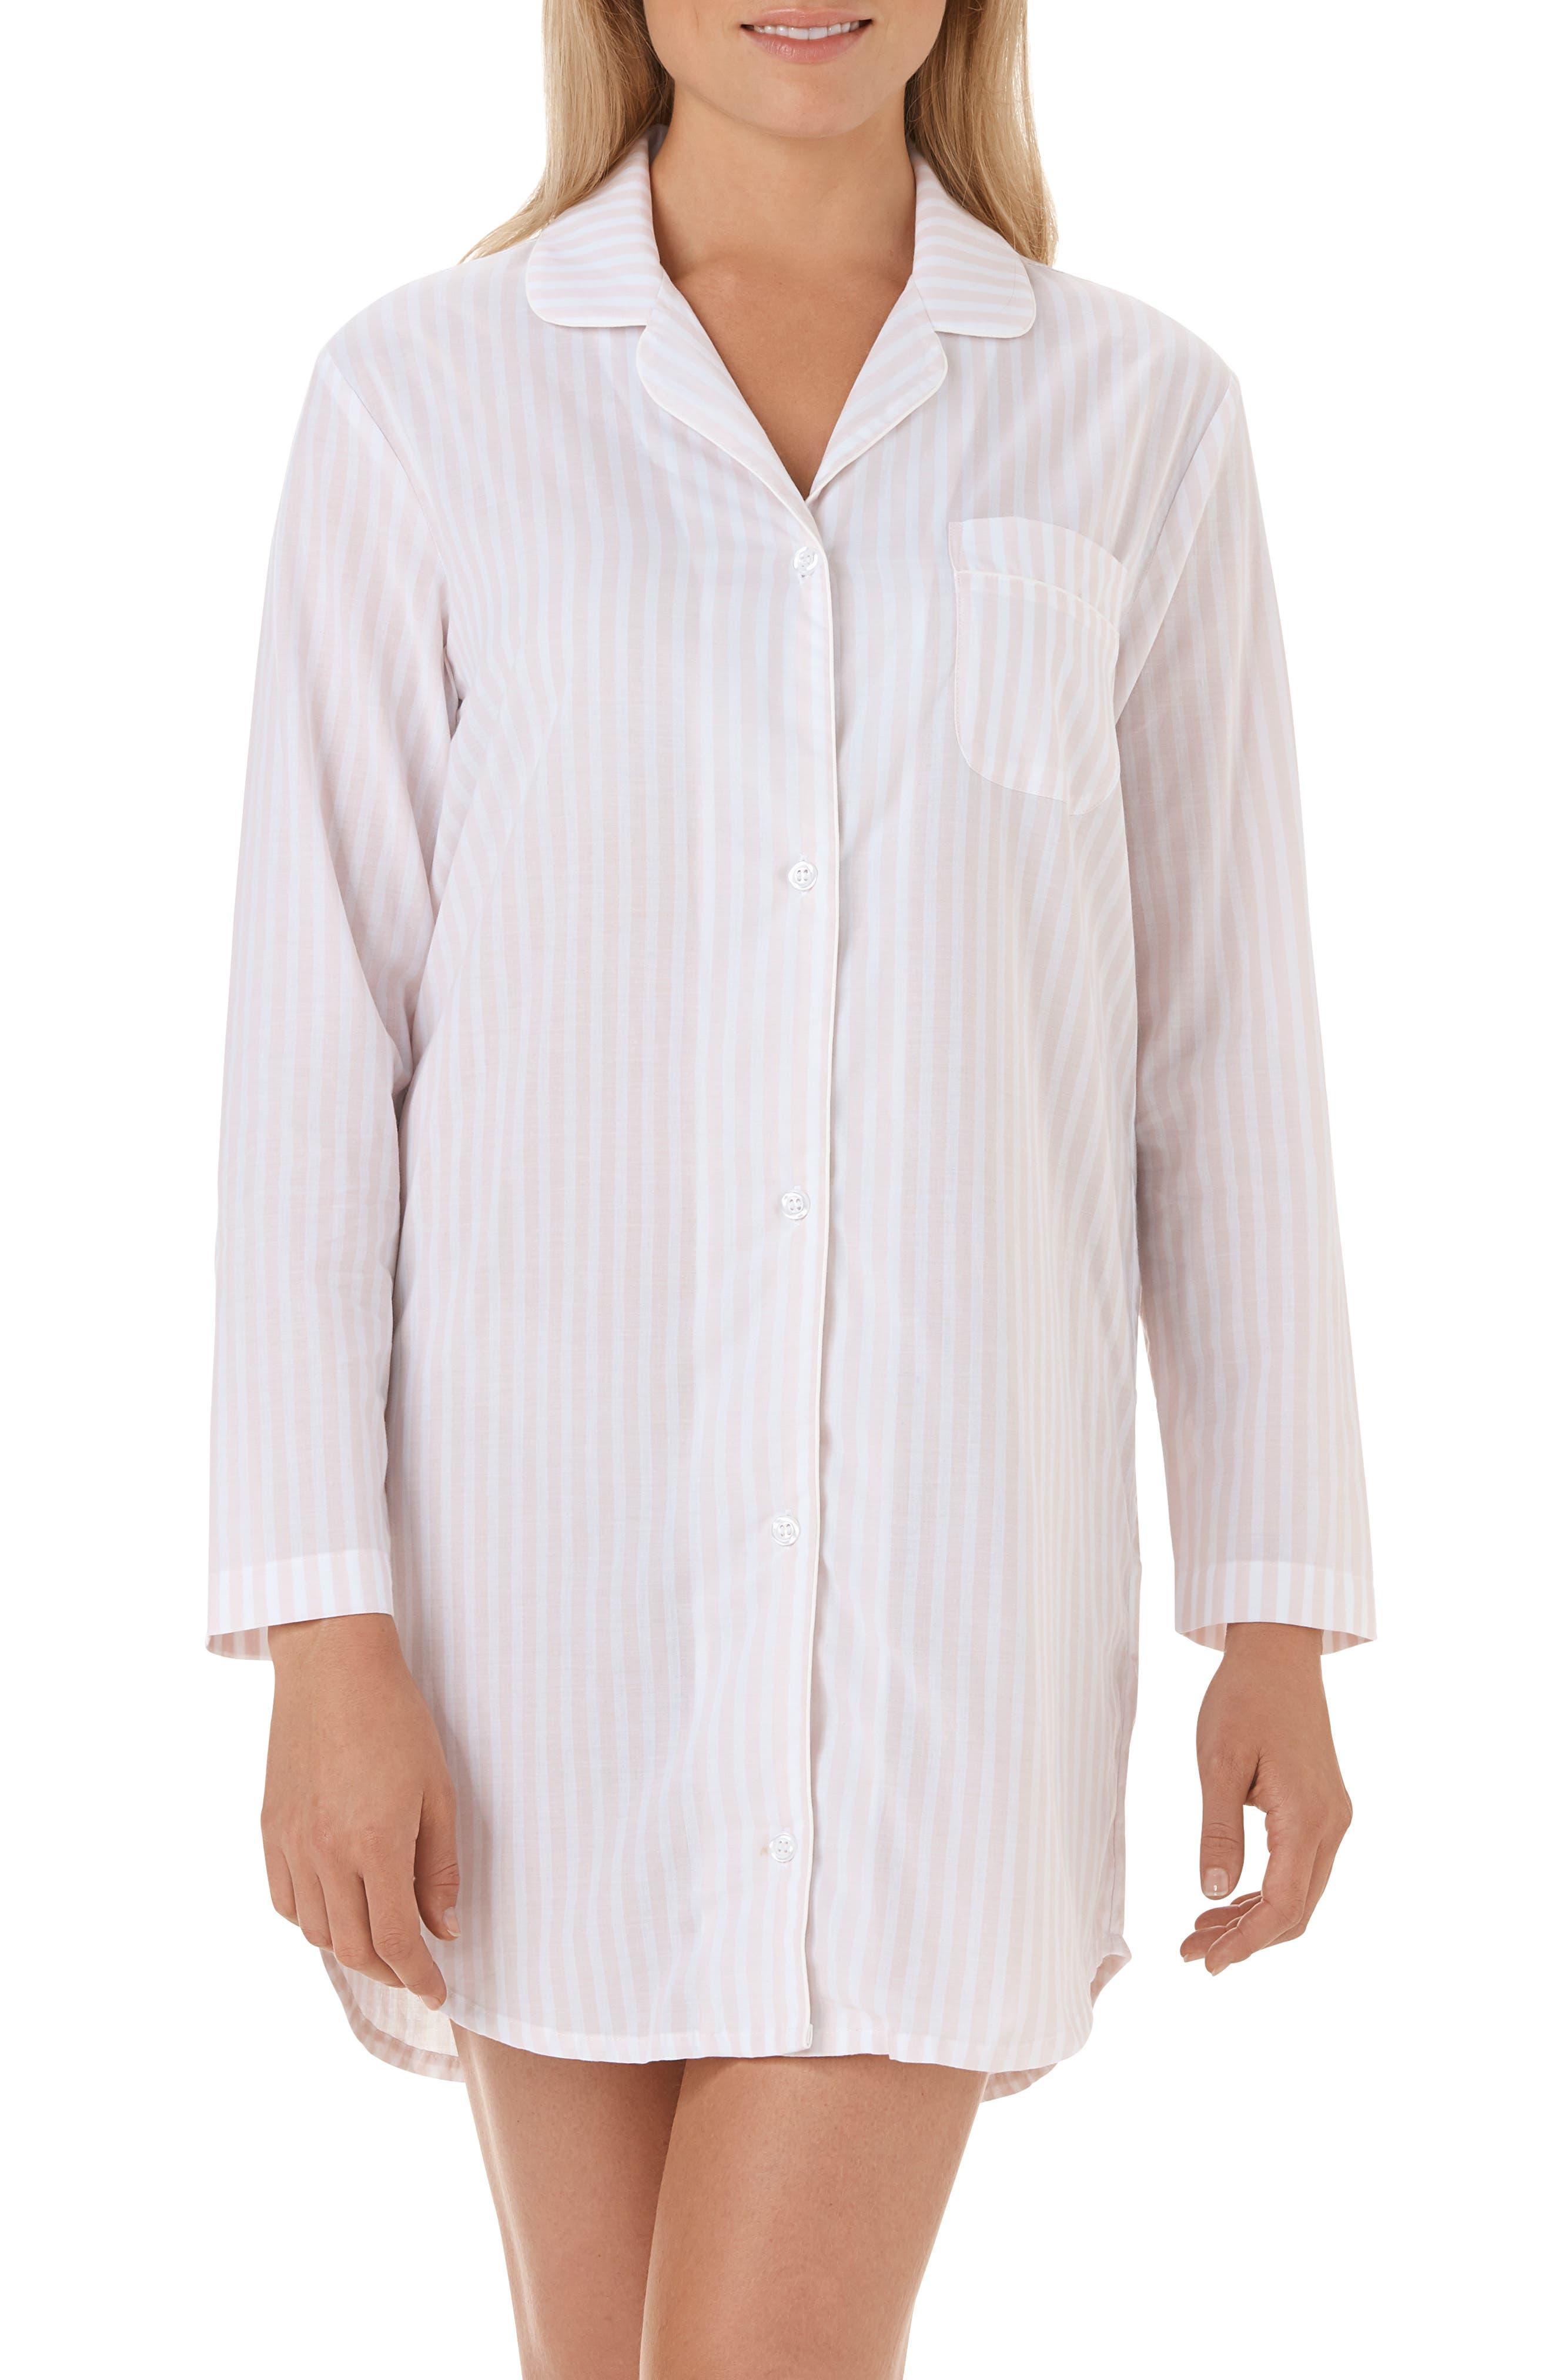 Stripe Cotton Sleep Shirt,                             Main thumbnail 1, color,                             PINK / WHITE STRIPE